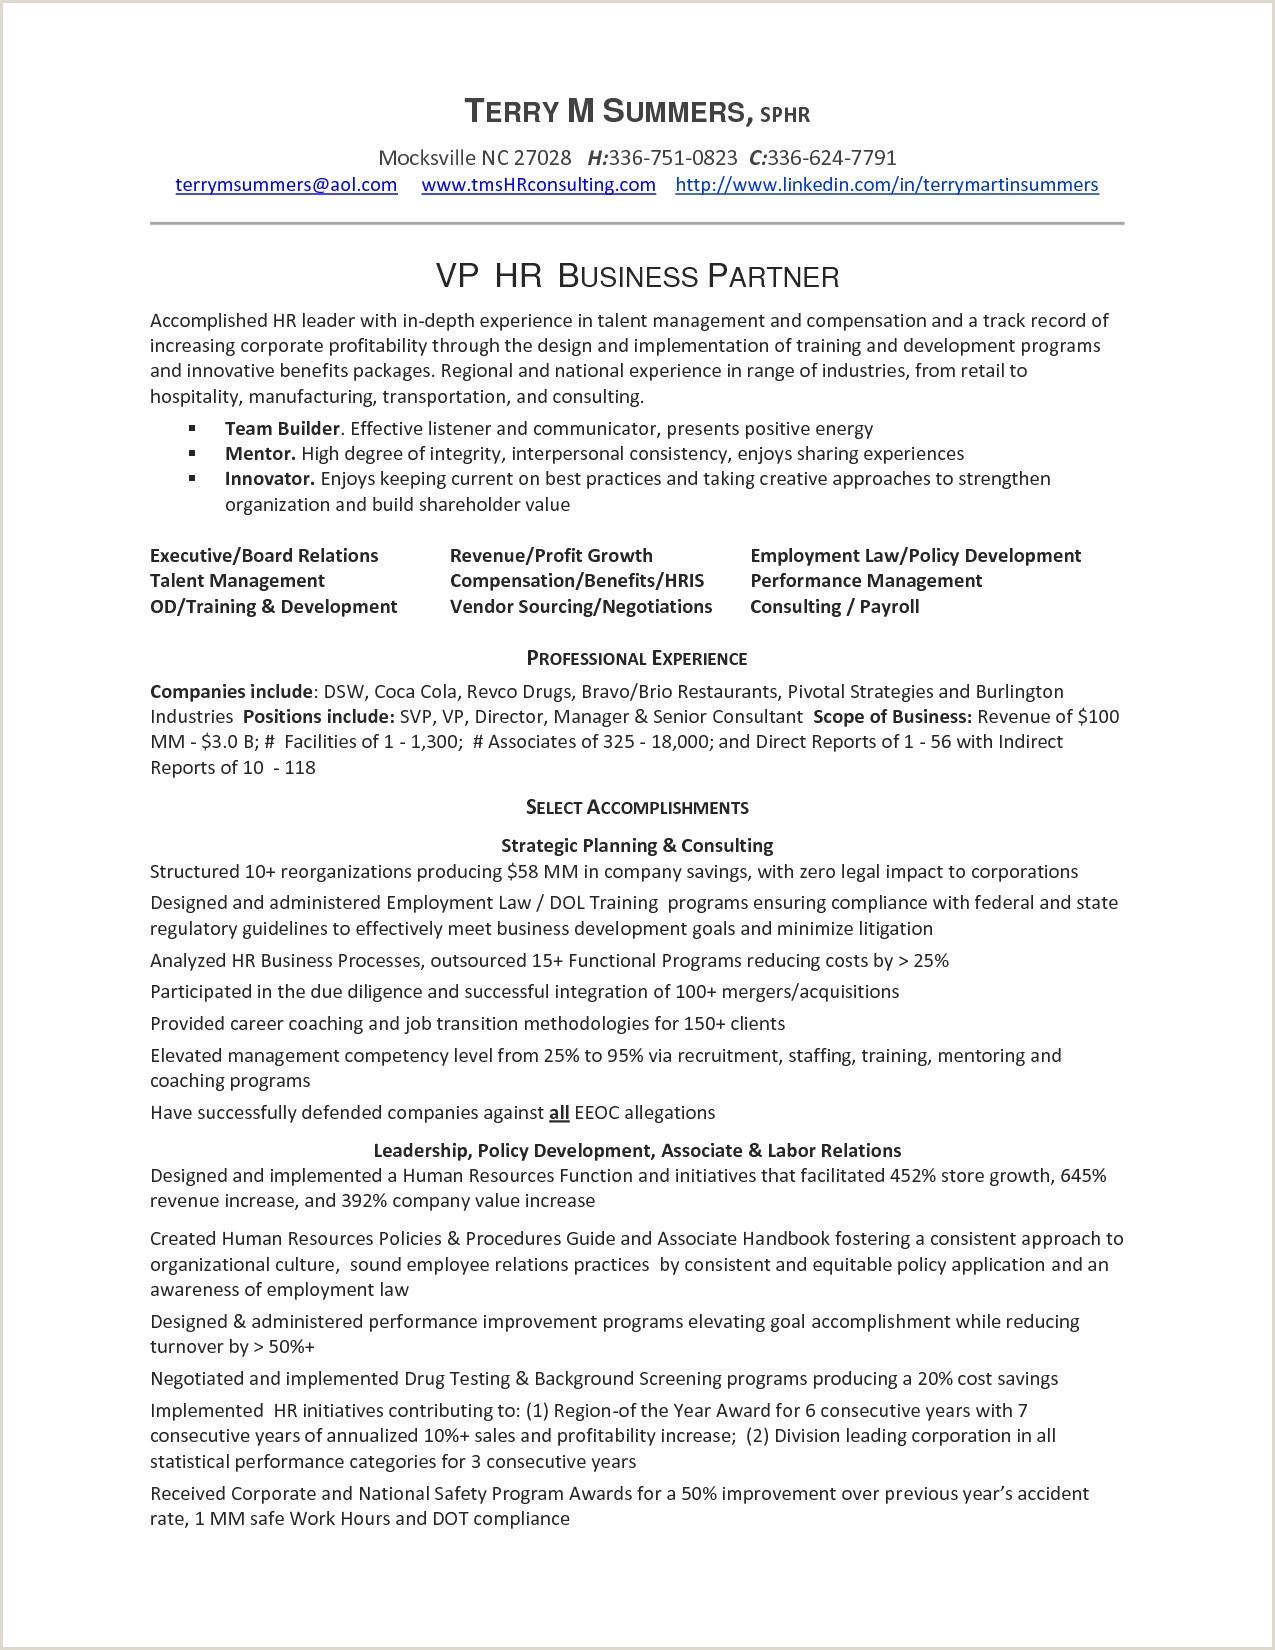 Cv Format For Job In Uk Car Sales Resumee Manager Cv Examples Uk Associate